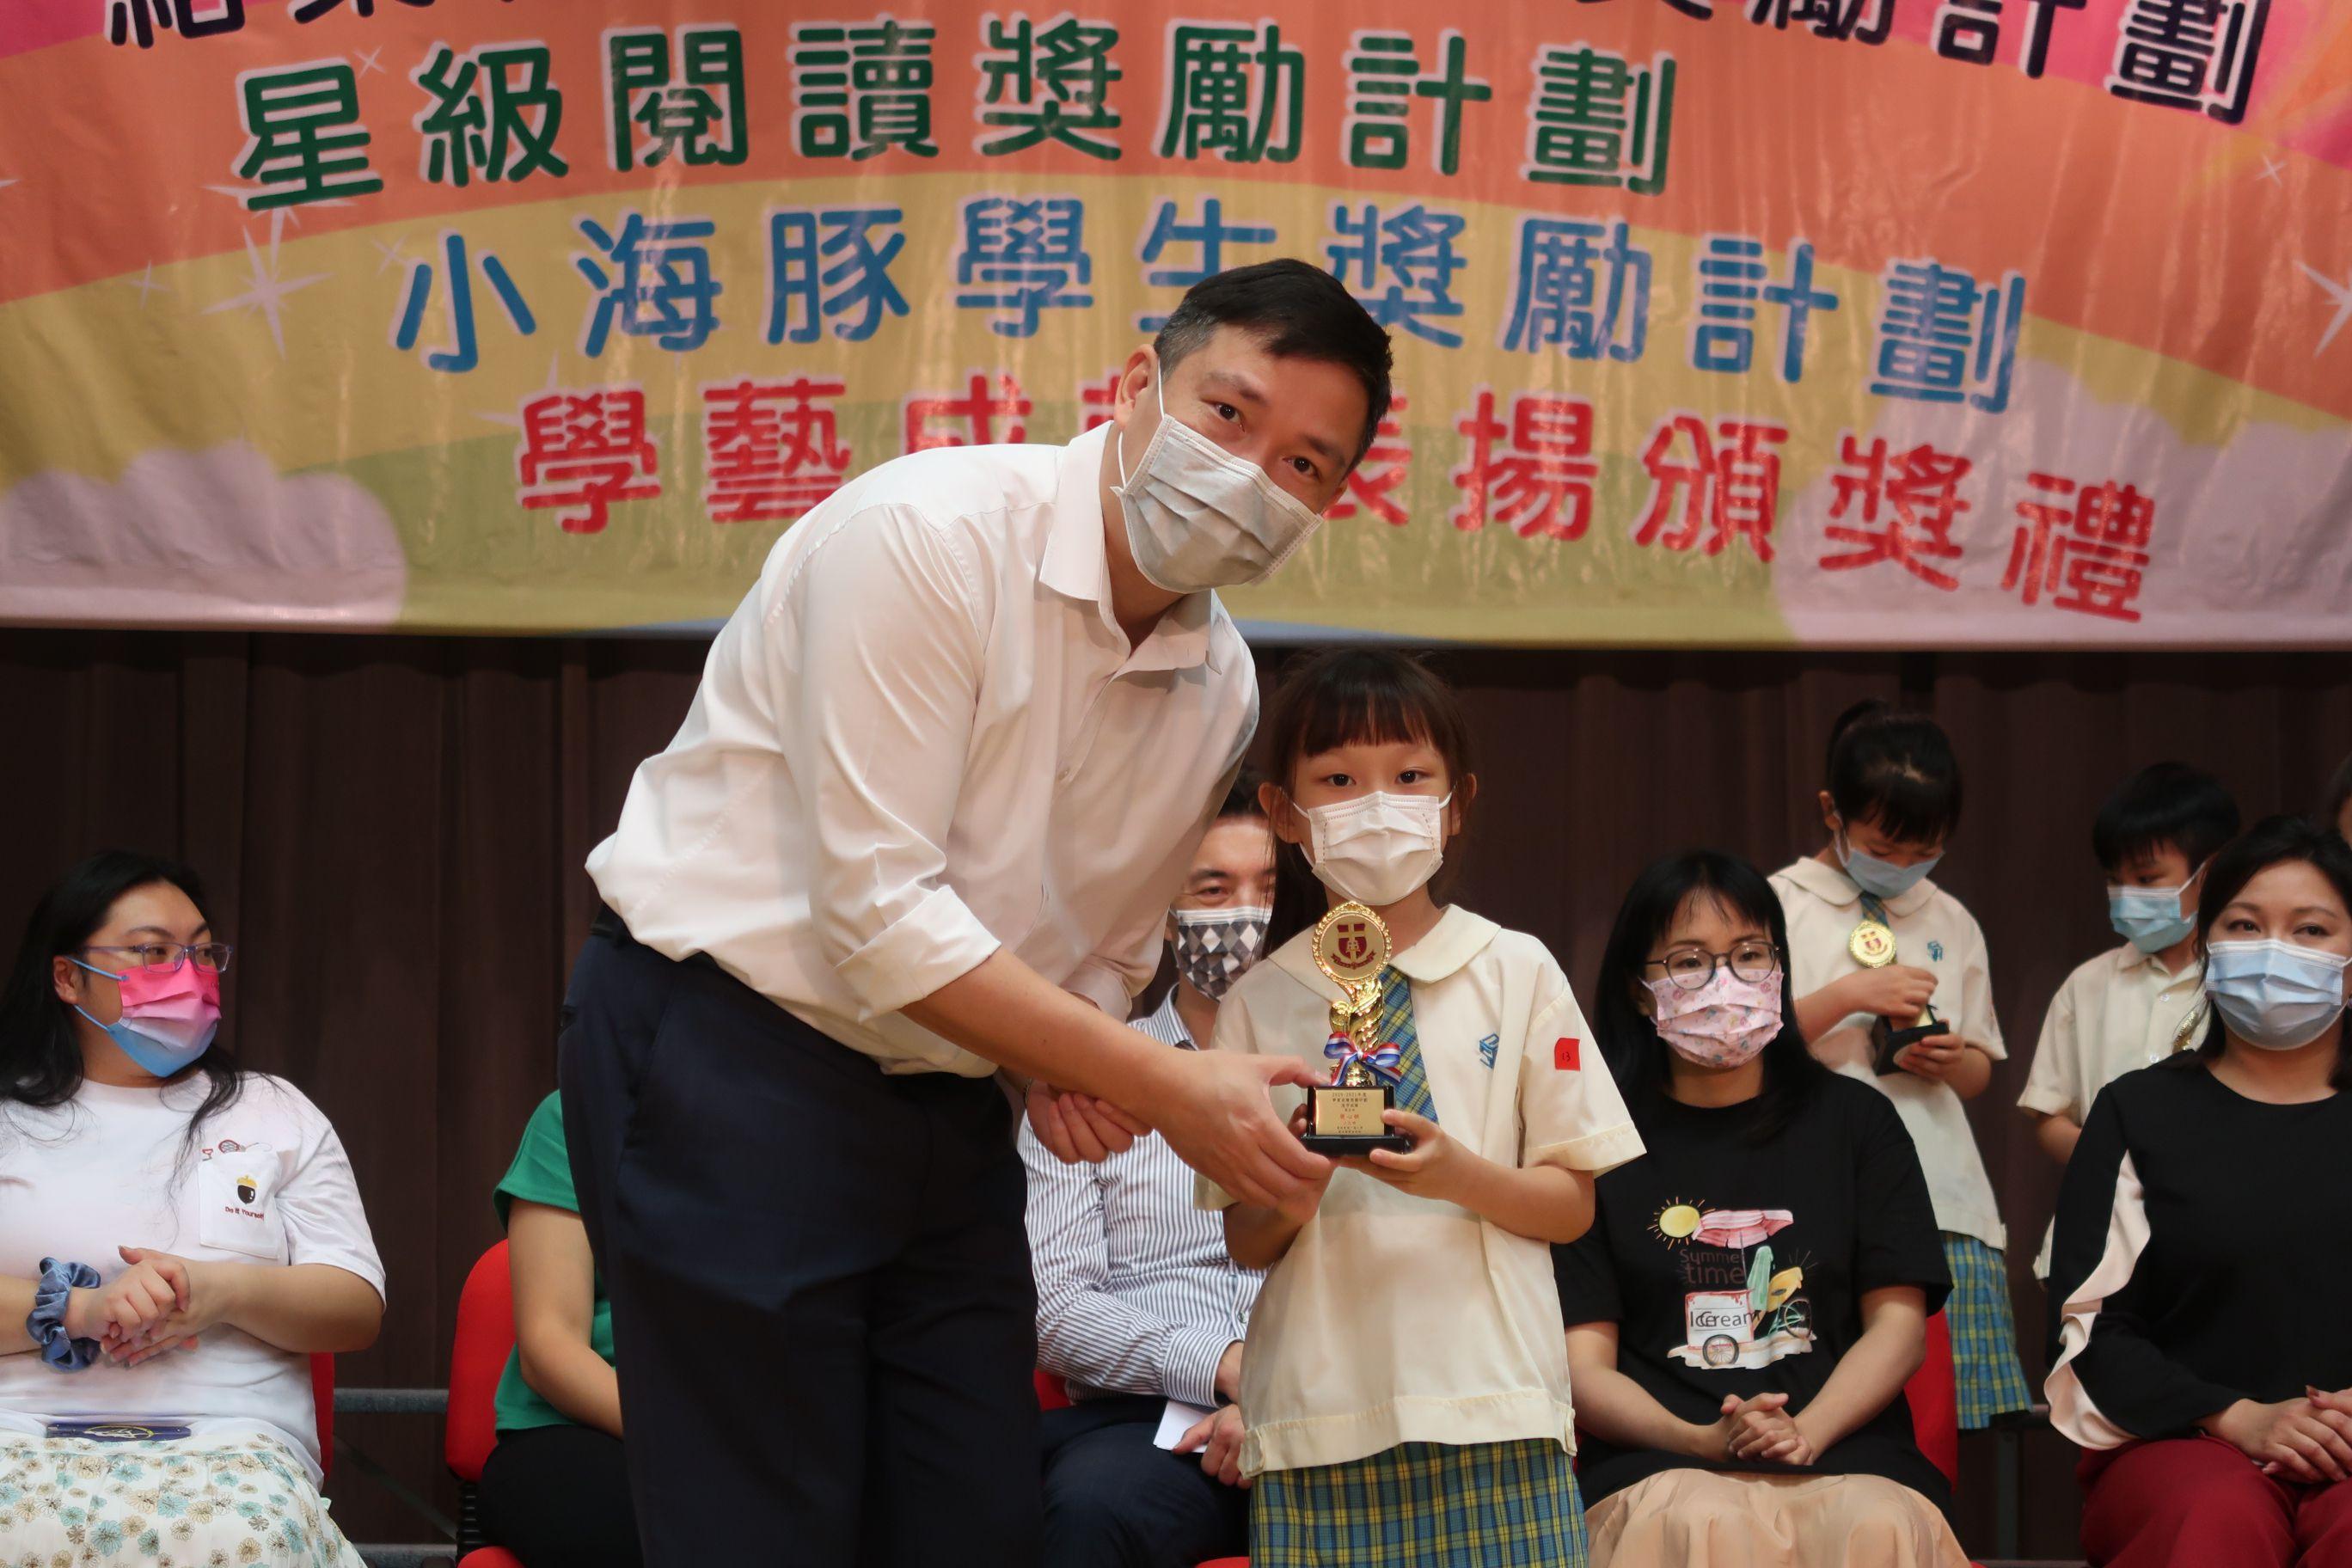 https://syh.edu.hk/sites/default/files/img_5653.jpg